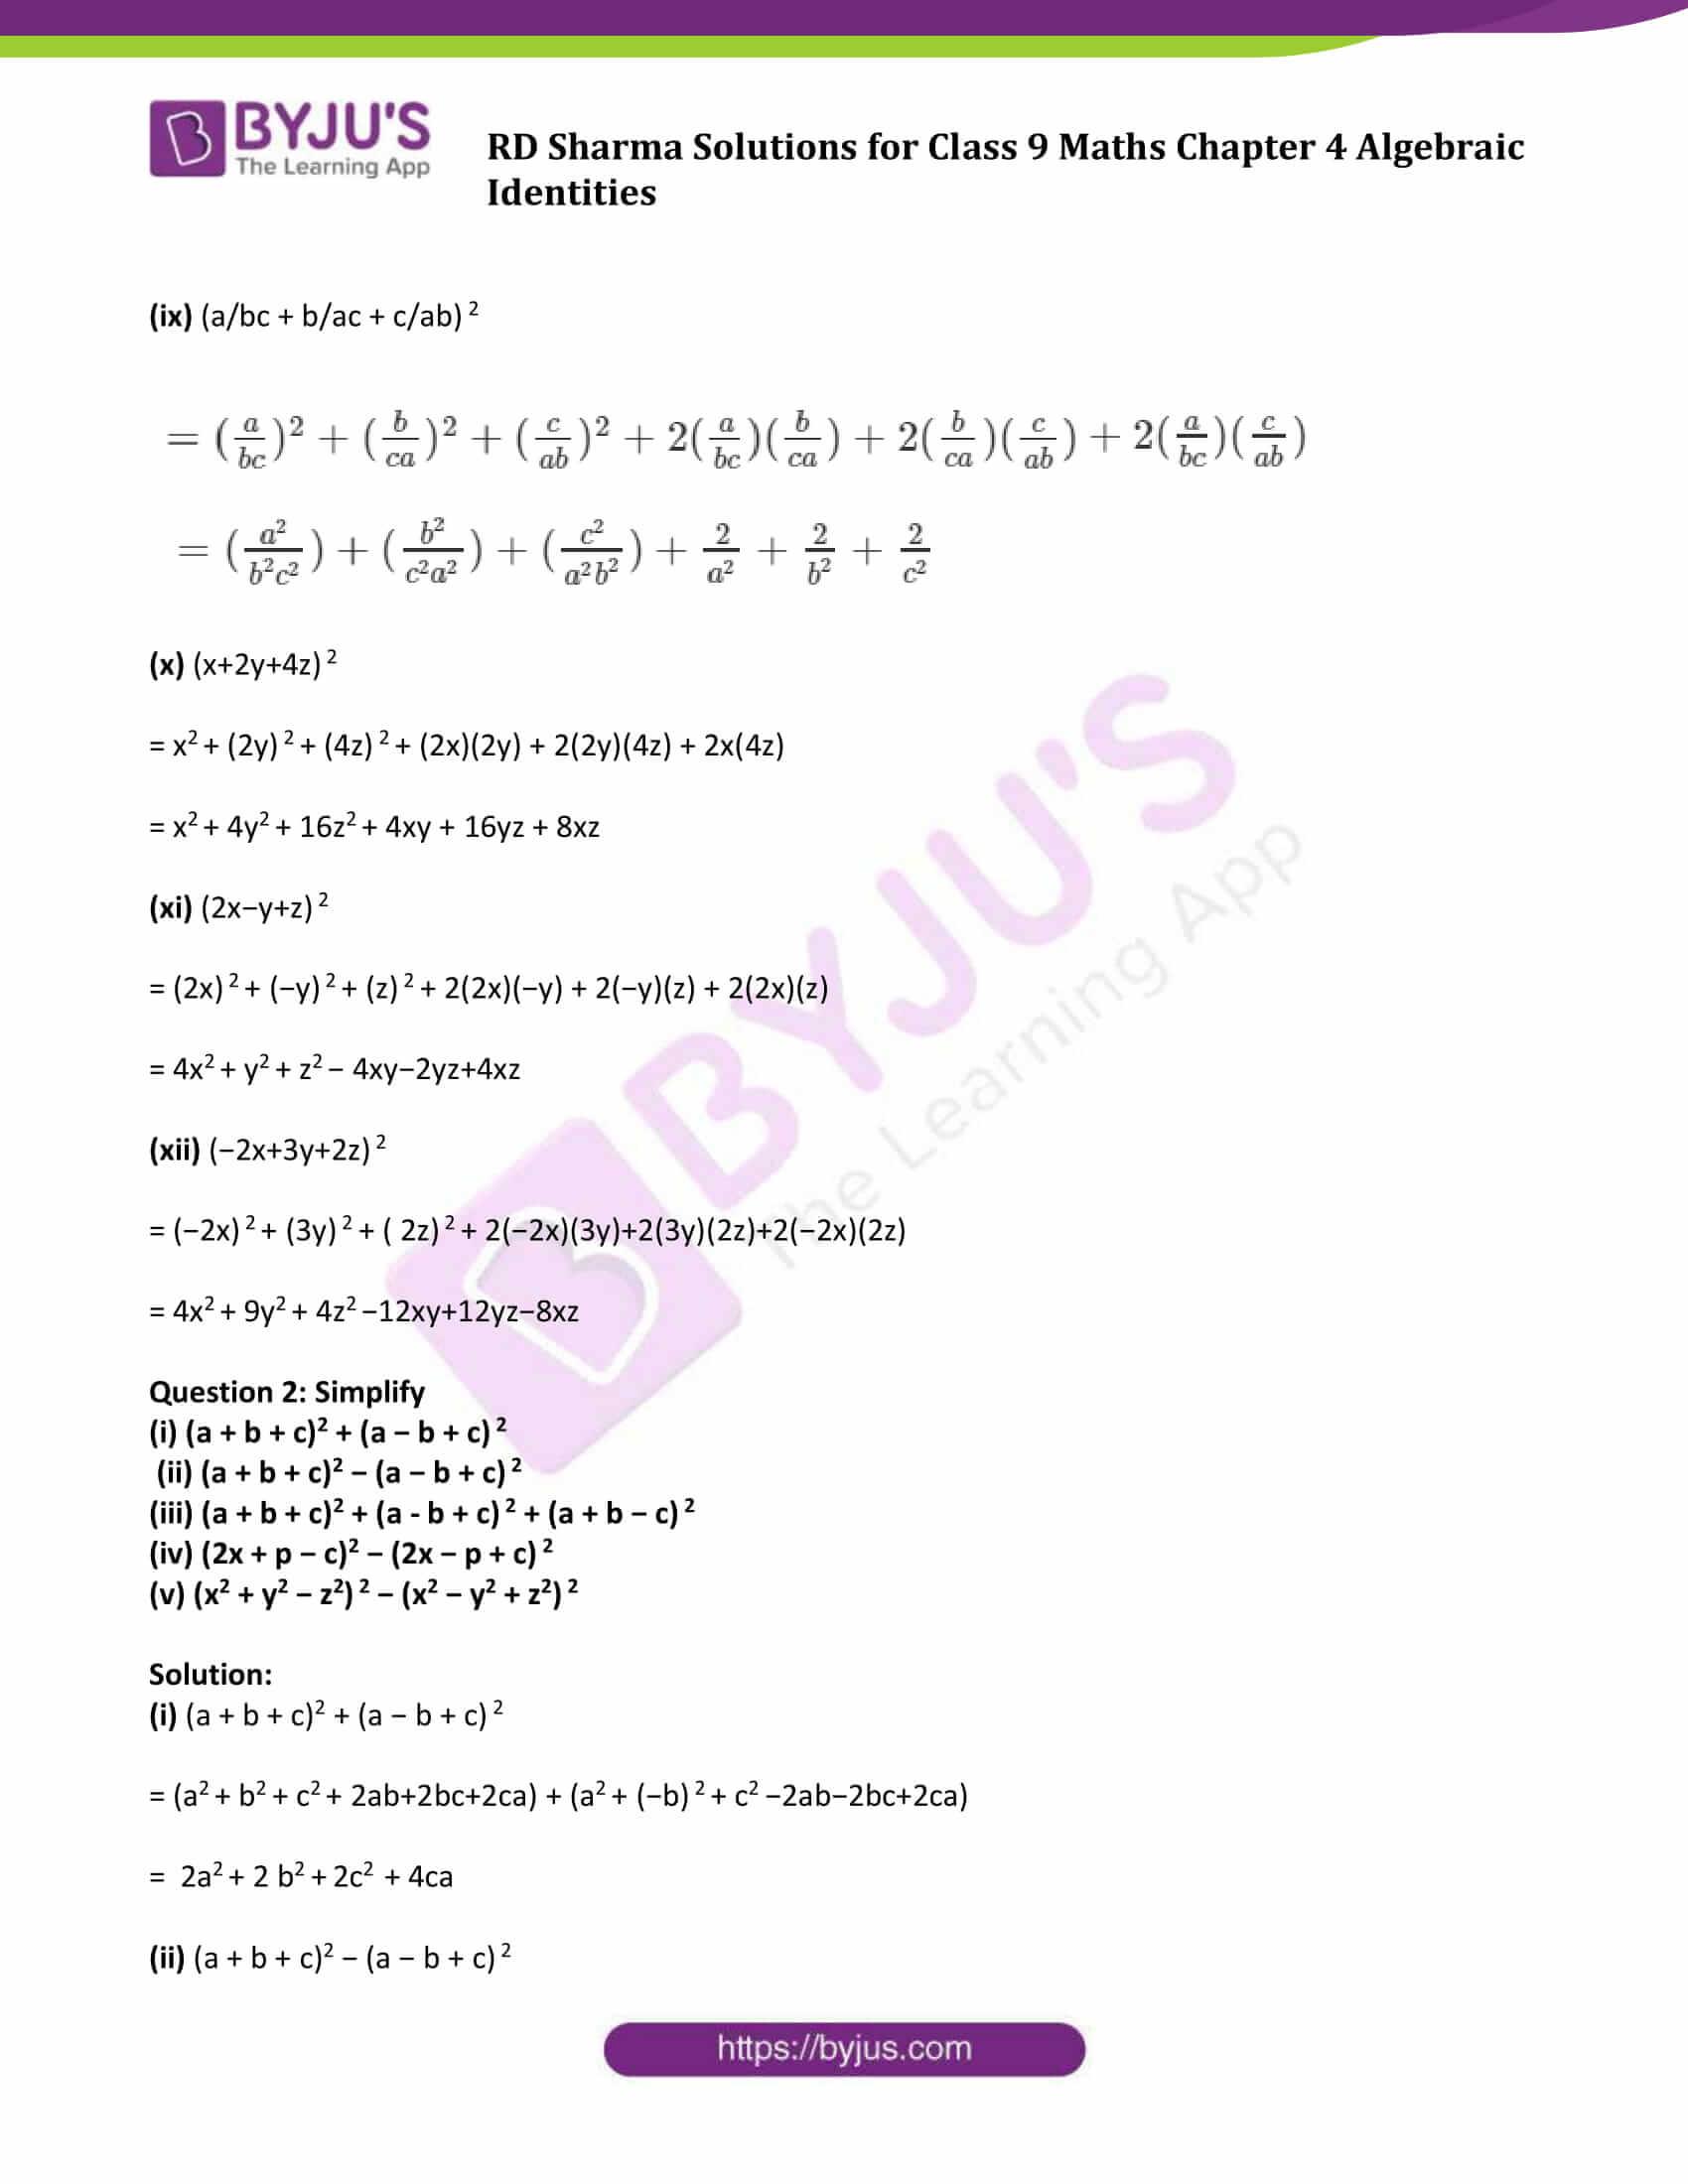 RD Sharma Solution class 9 Maths Chapter 4 Algebraic Identities 08